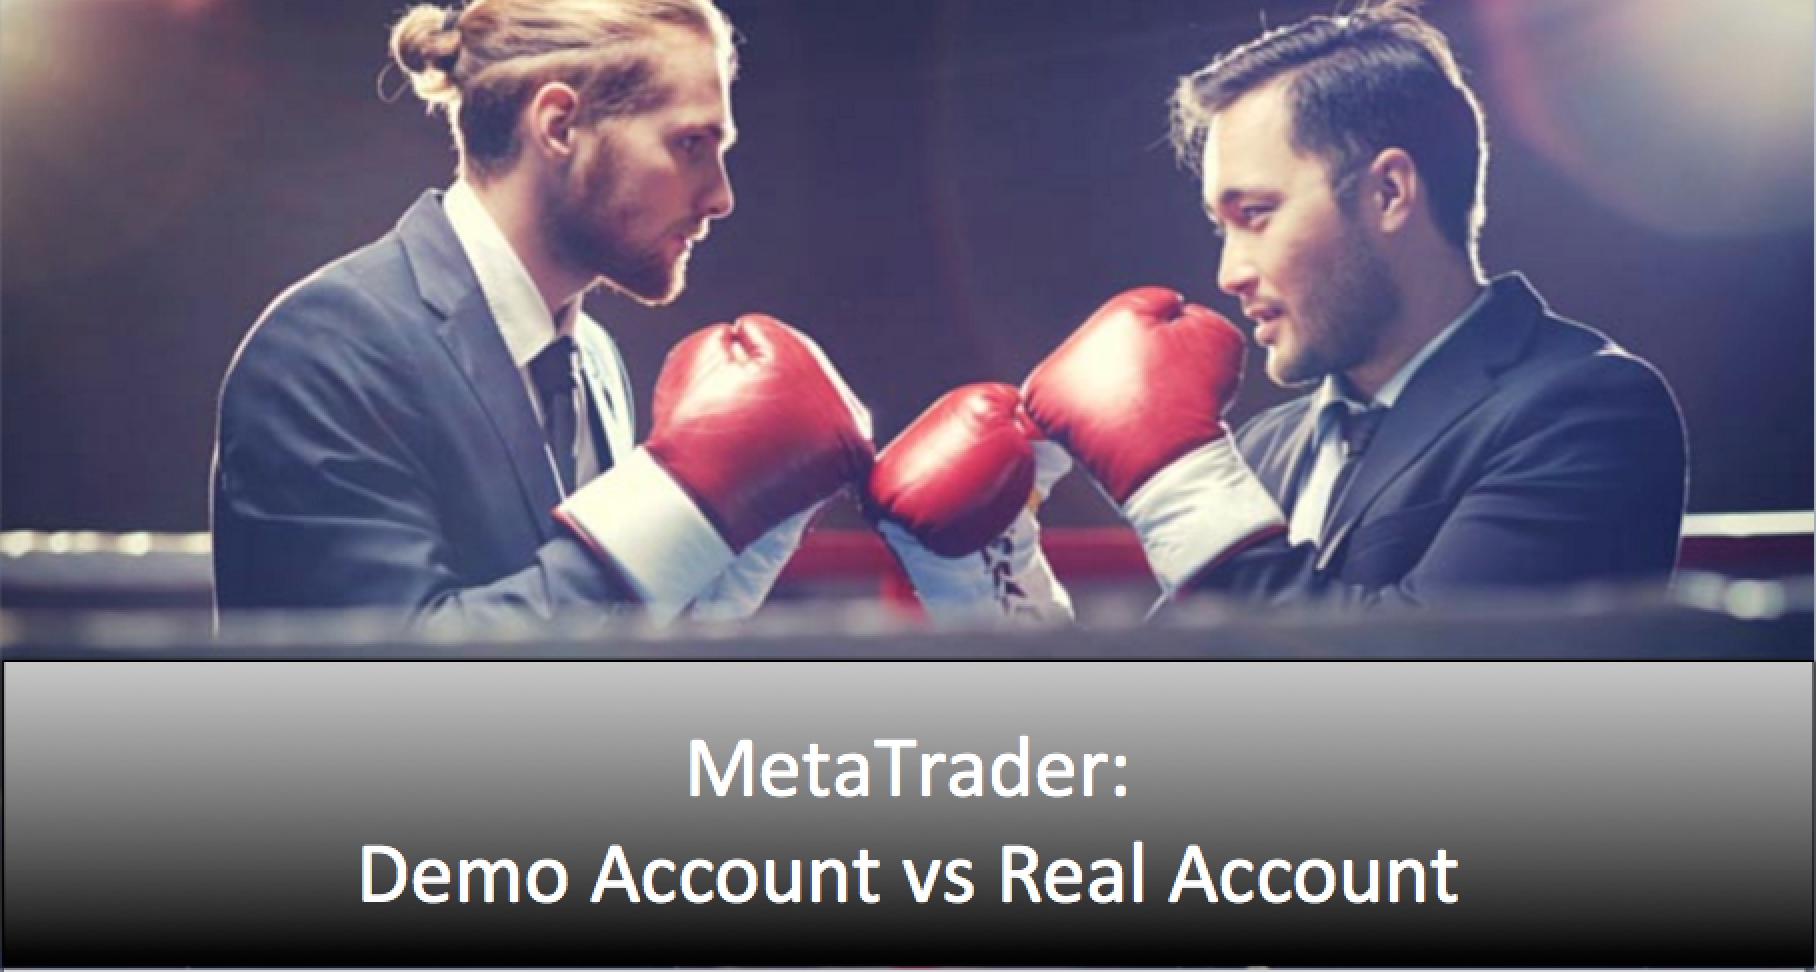 MetaTrader demo vs real accounts